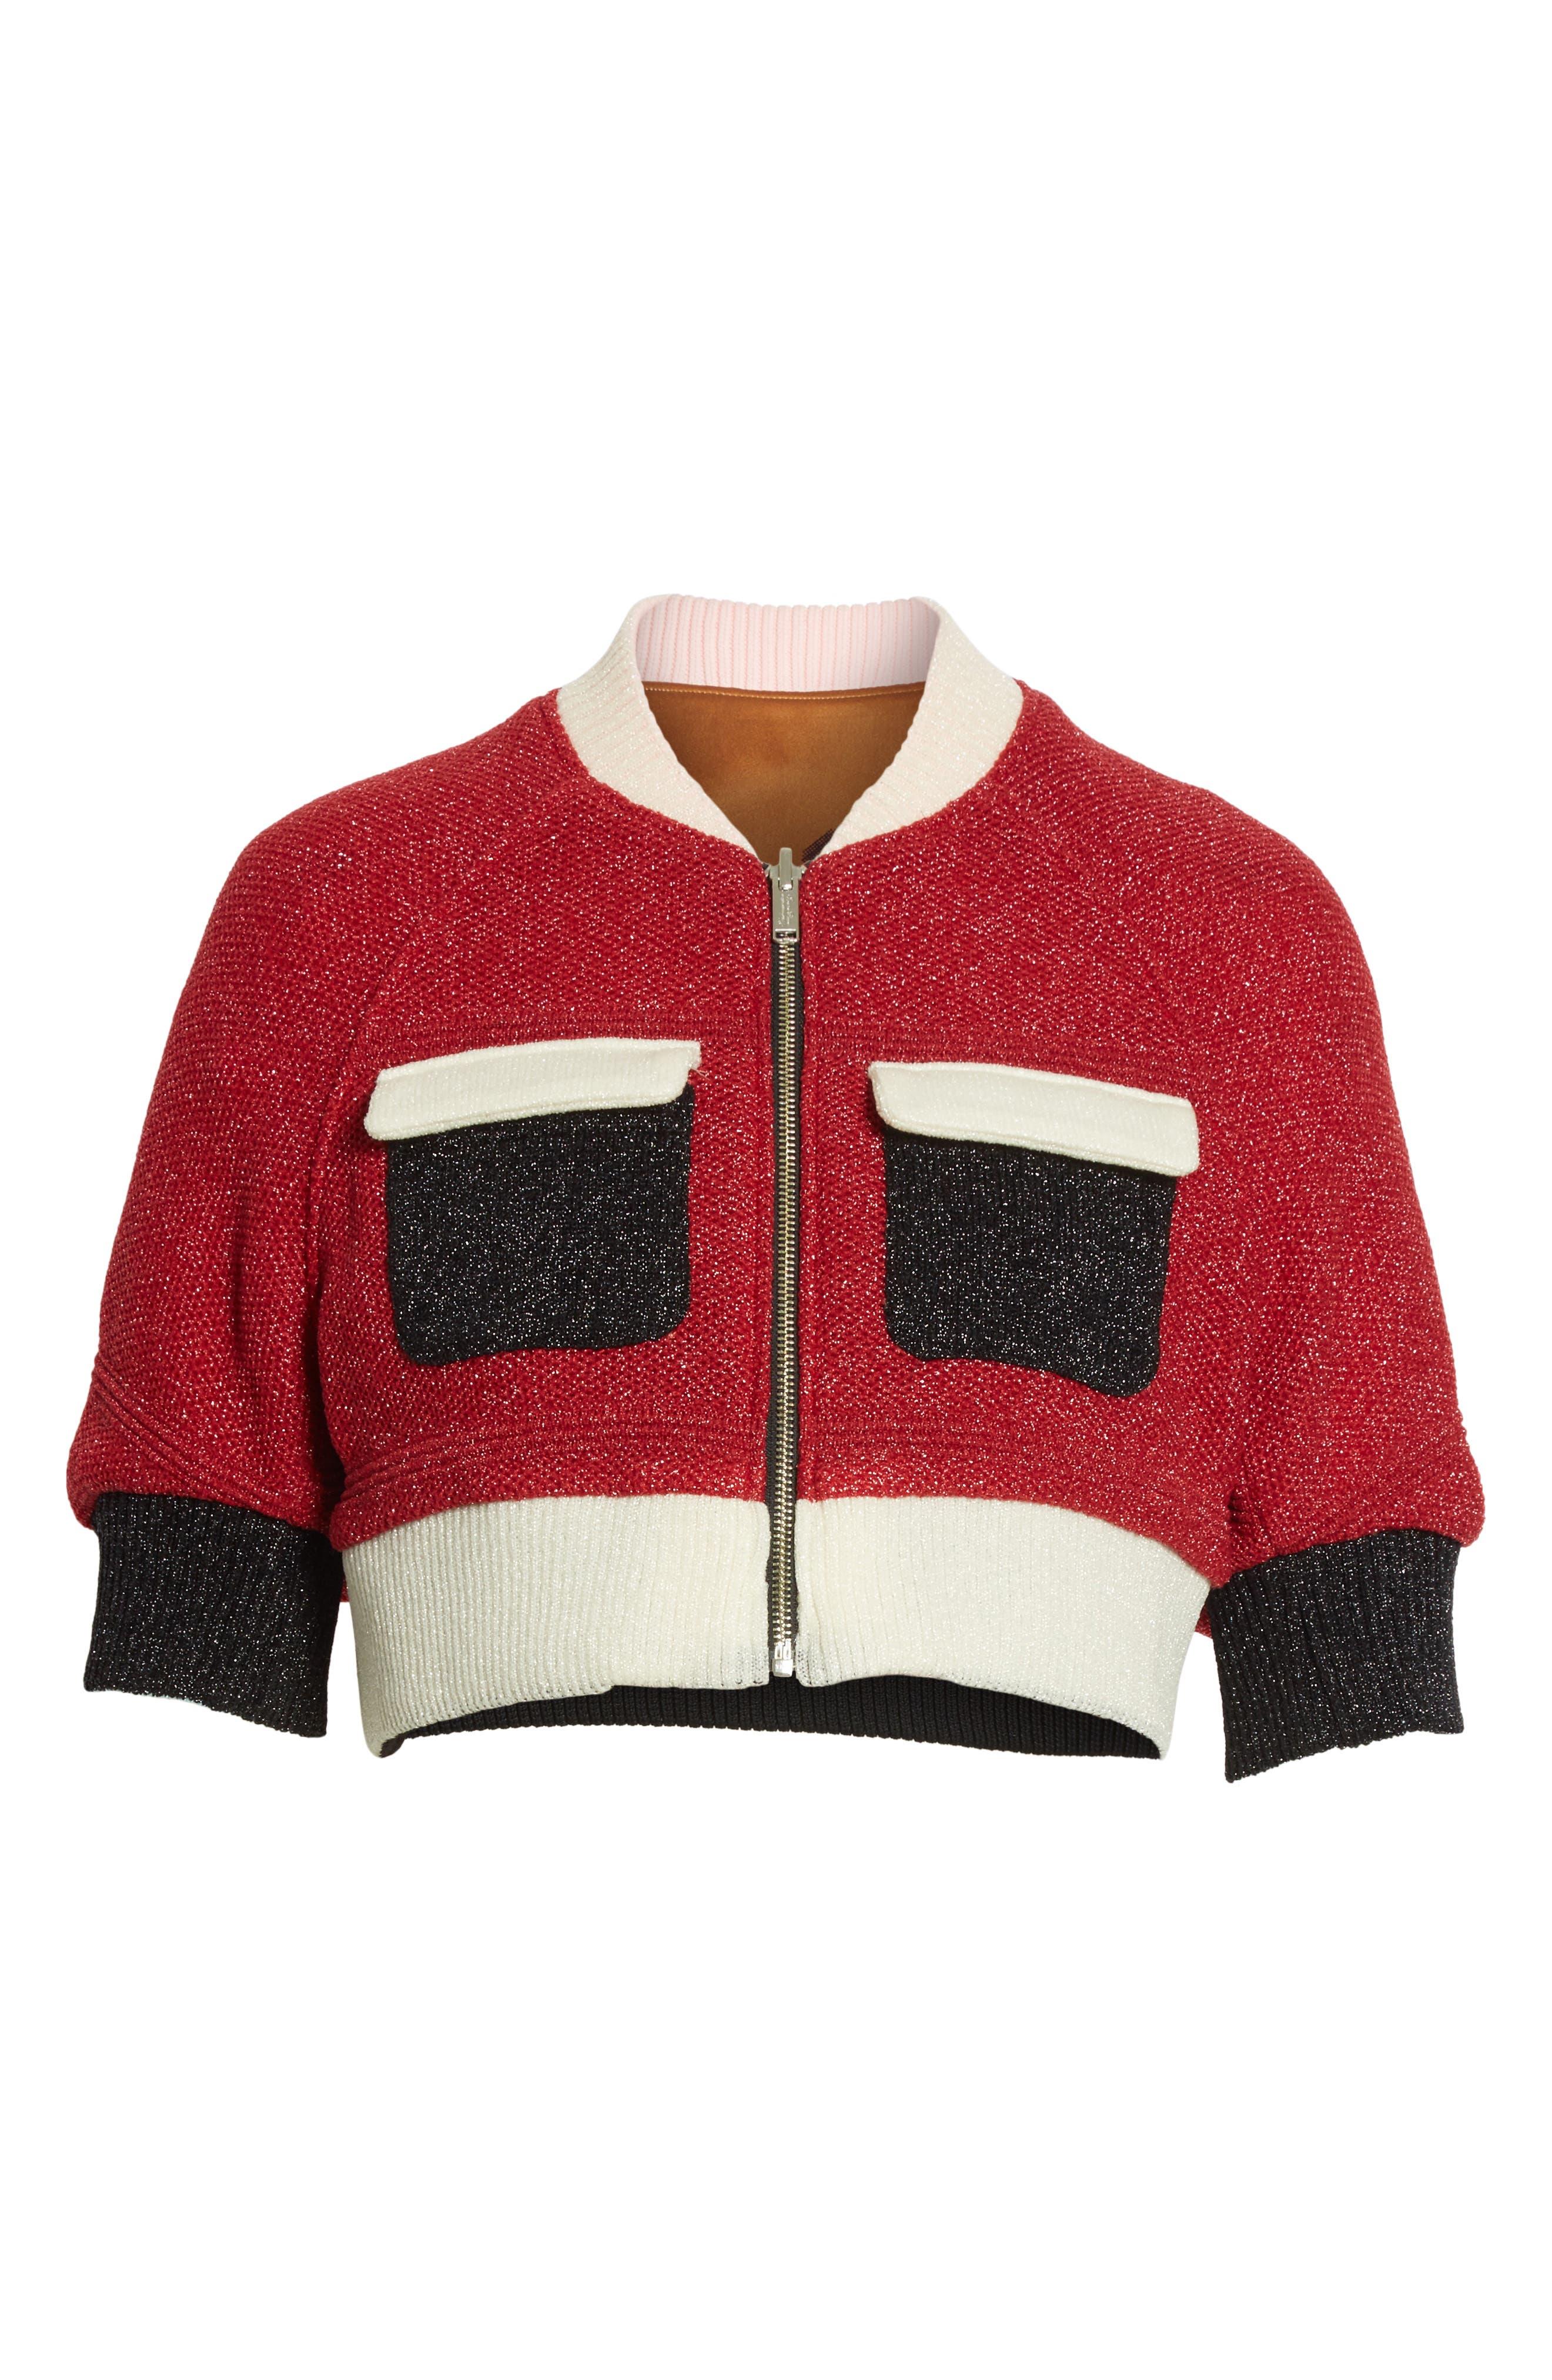 Reversible Crop Jacket,                             Alternate thumbnail 7, color,                             Brown/ Red